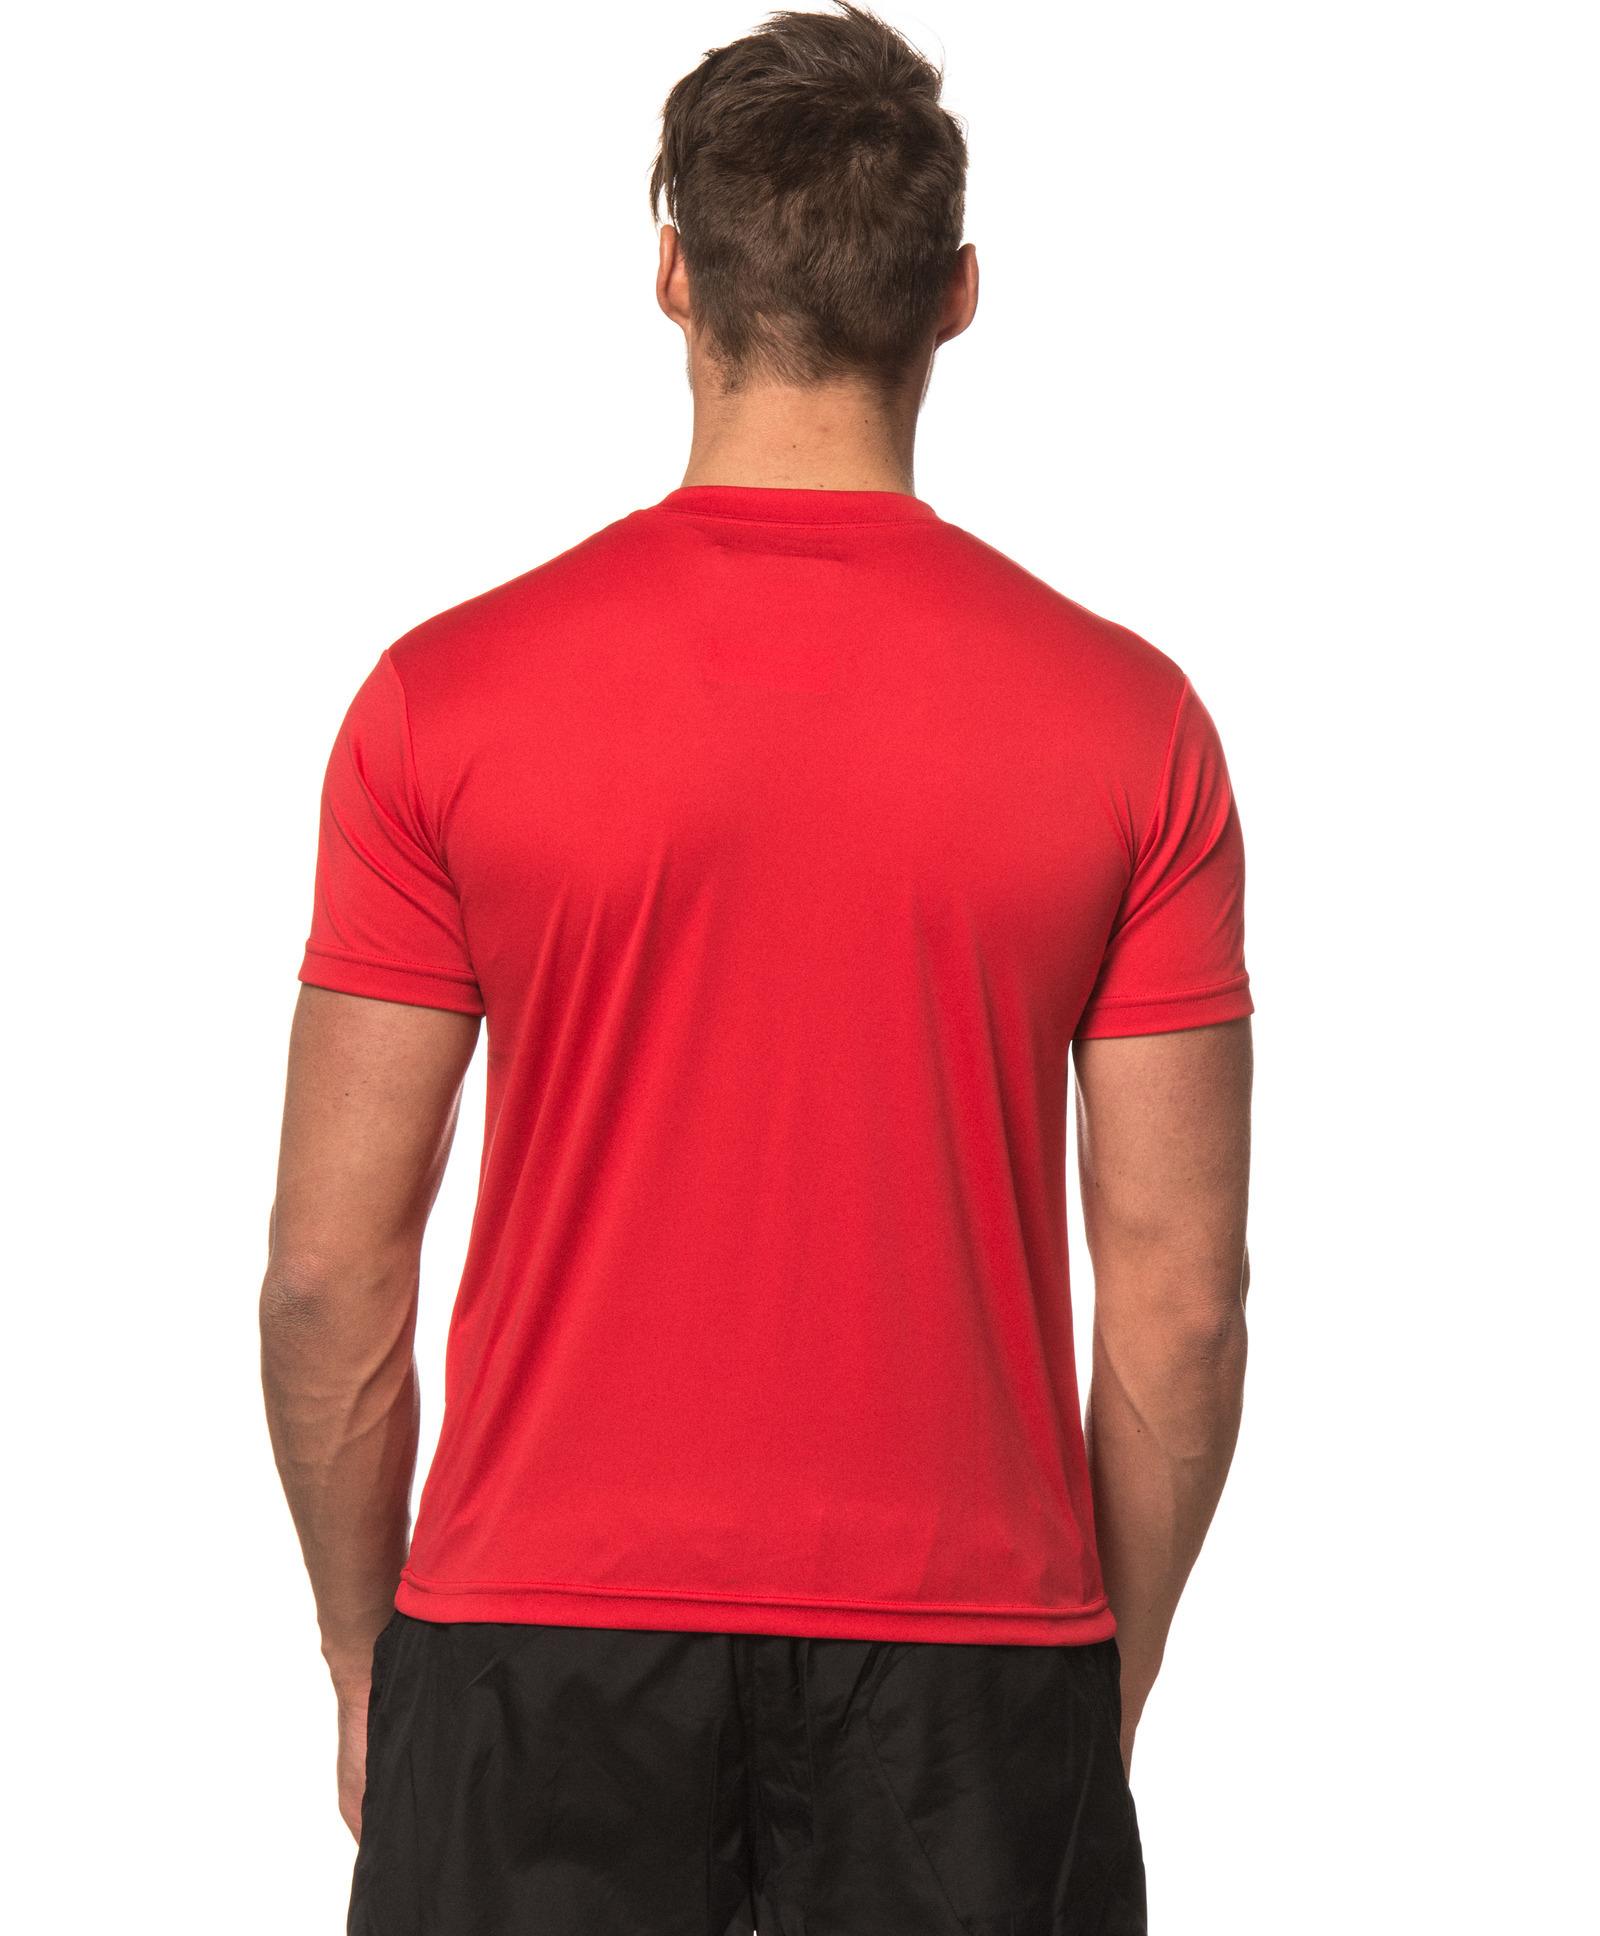 Футболка Craft Active Run Logo Tee мужская red - 3